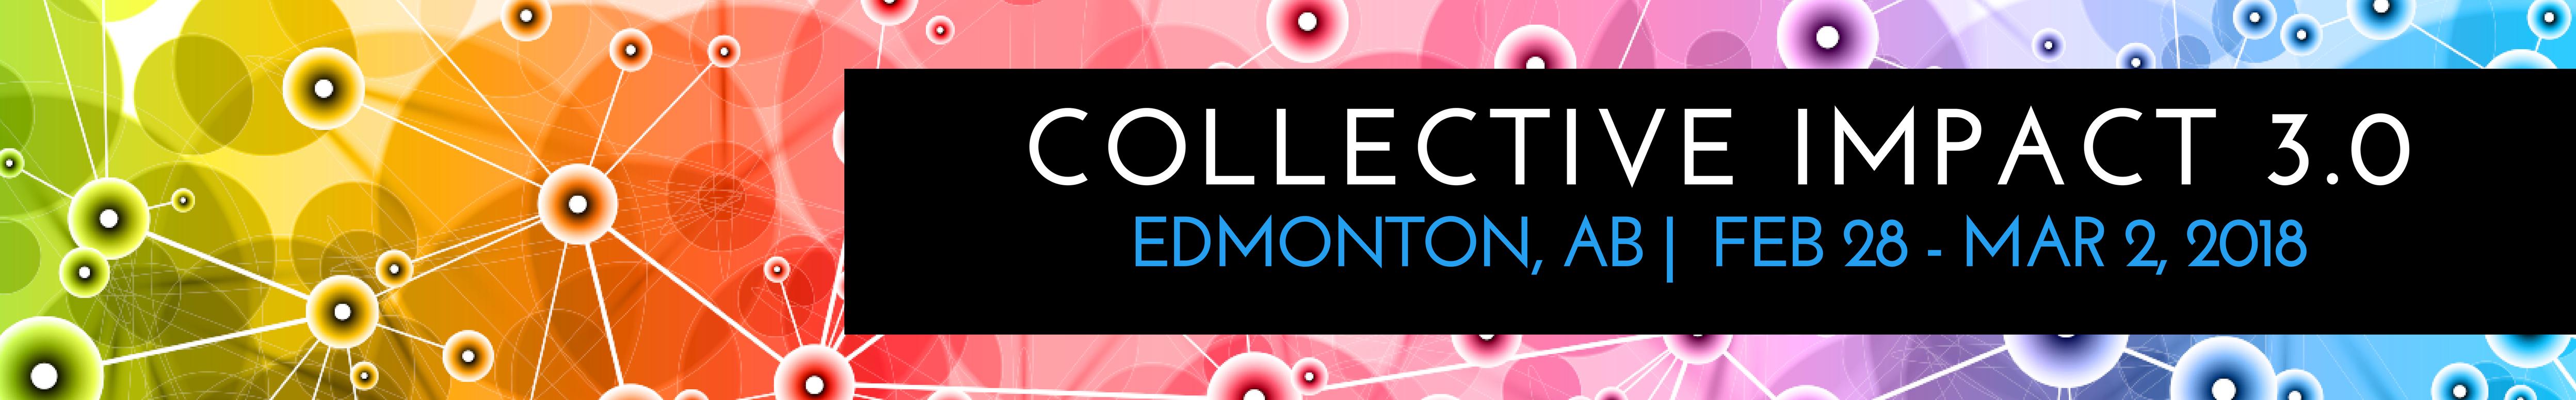 2018 CI Edmonton Banner.png